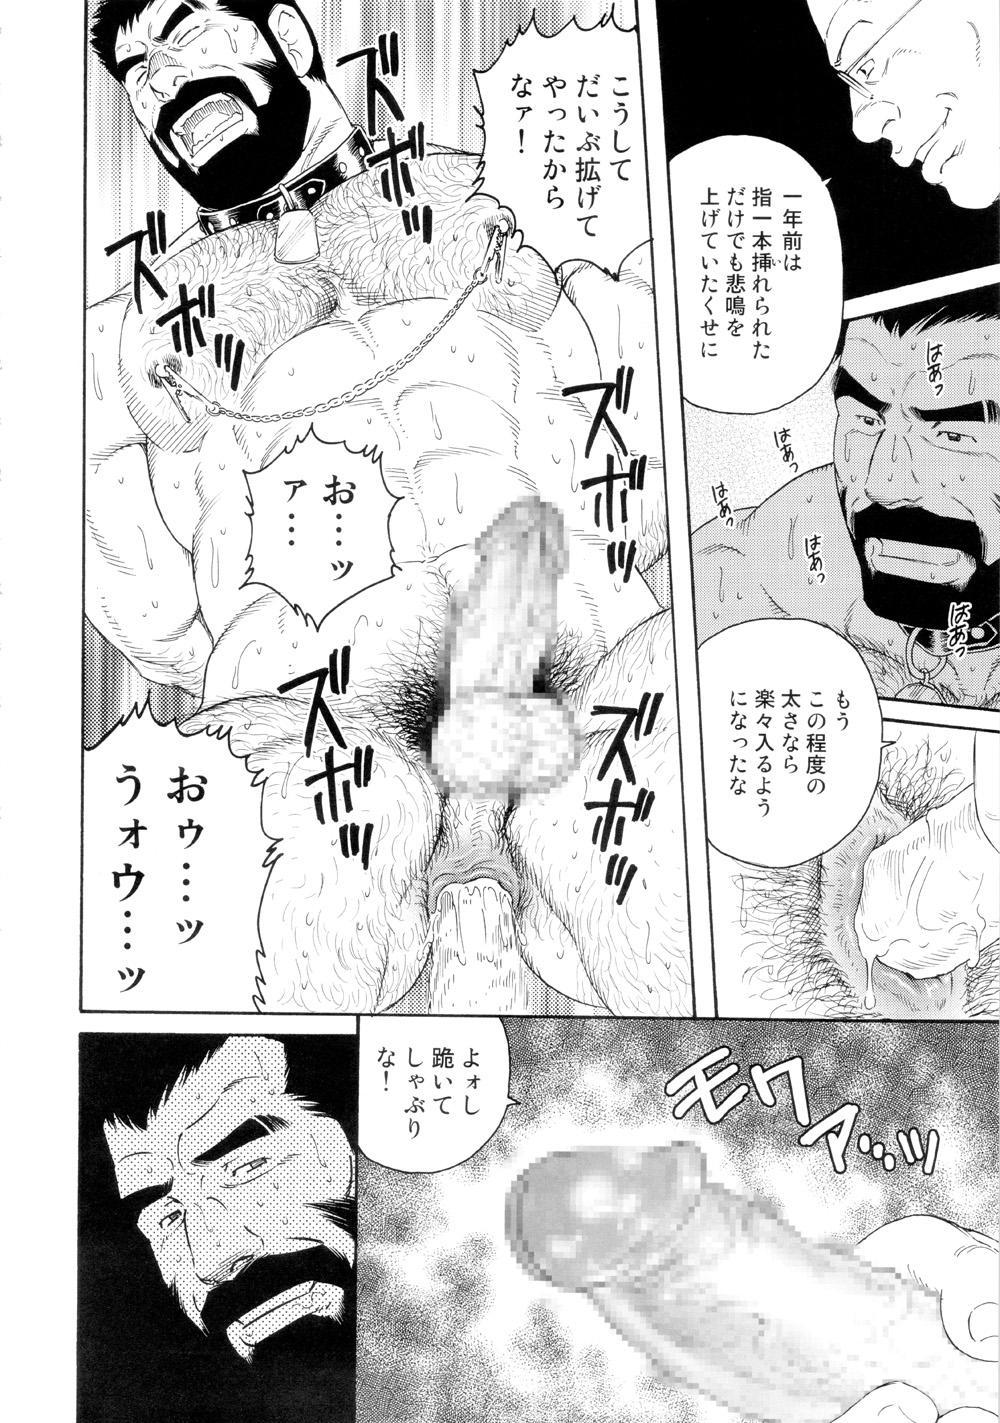 Genryu Chapter 1 11